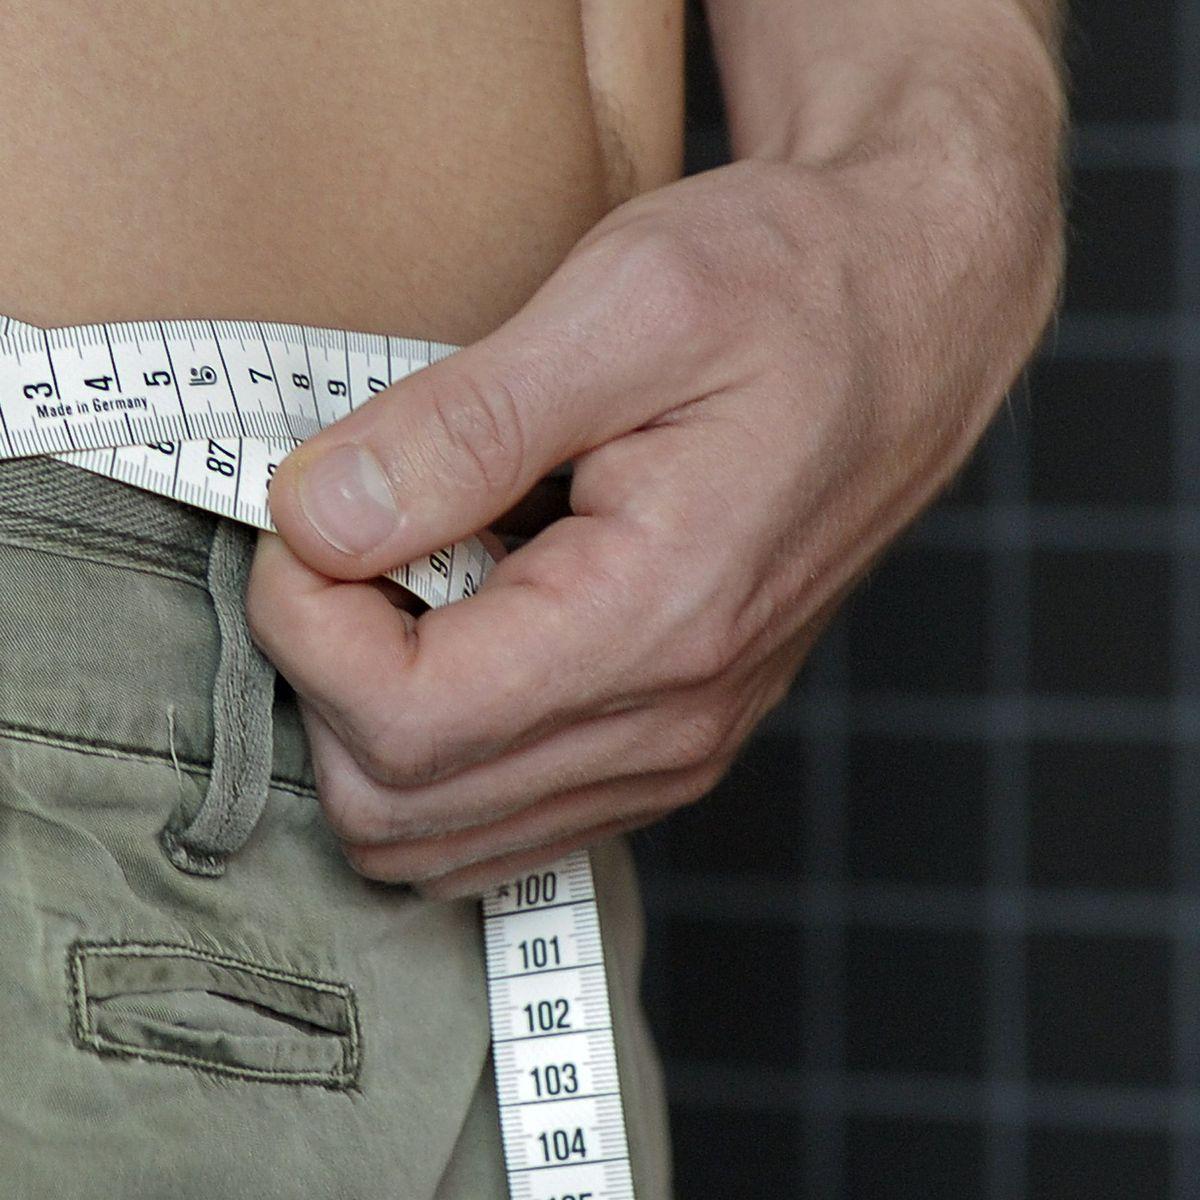 Mann dünn bauch aber dicker Extrem schlank,